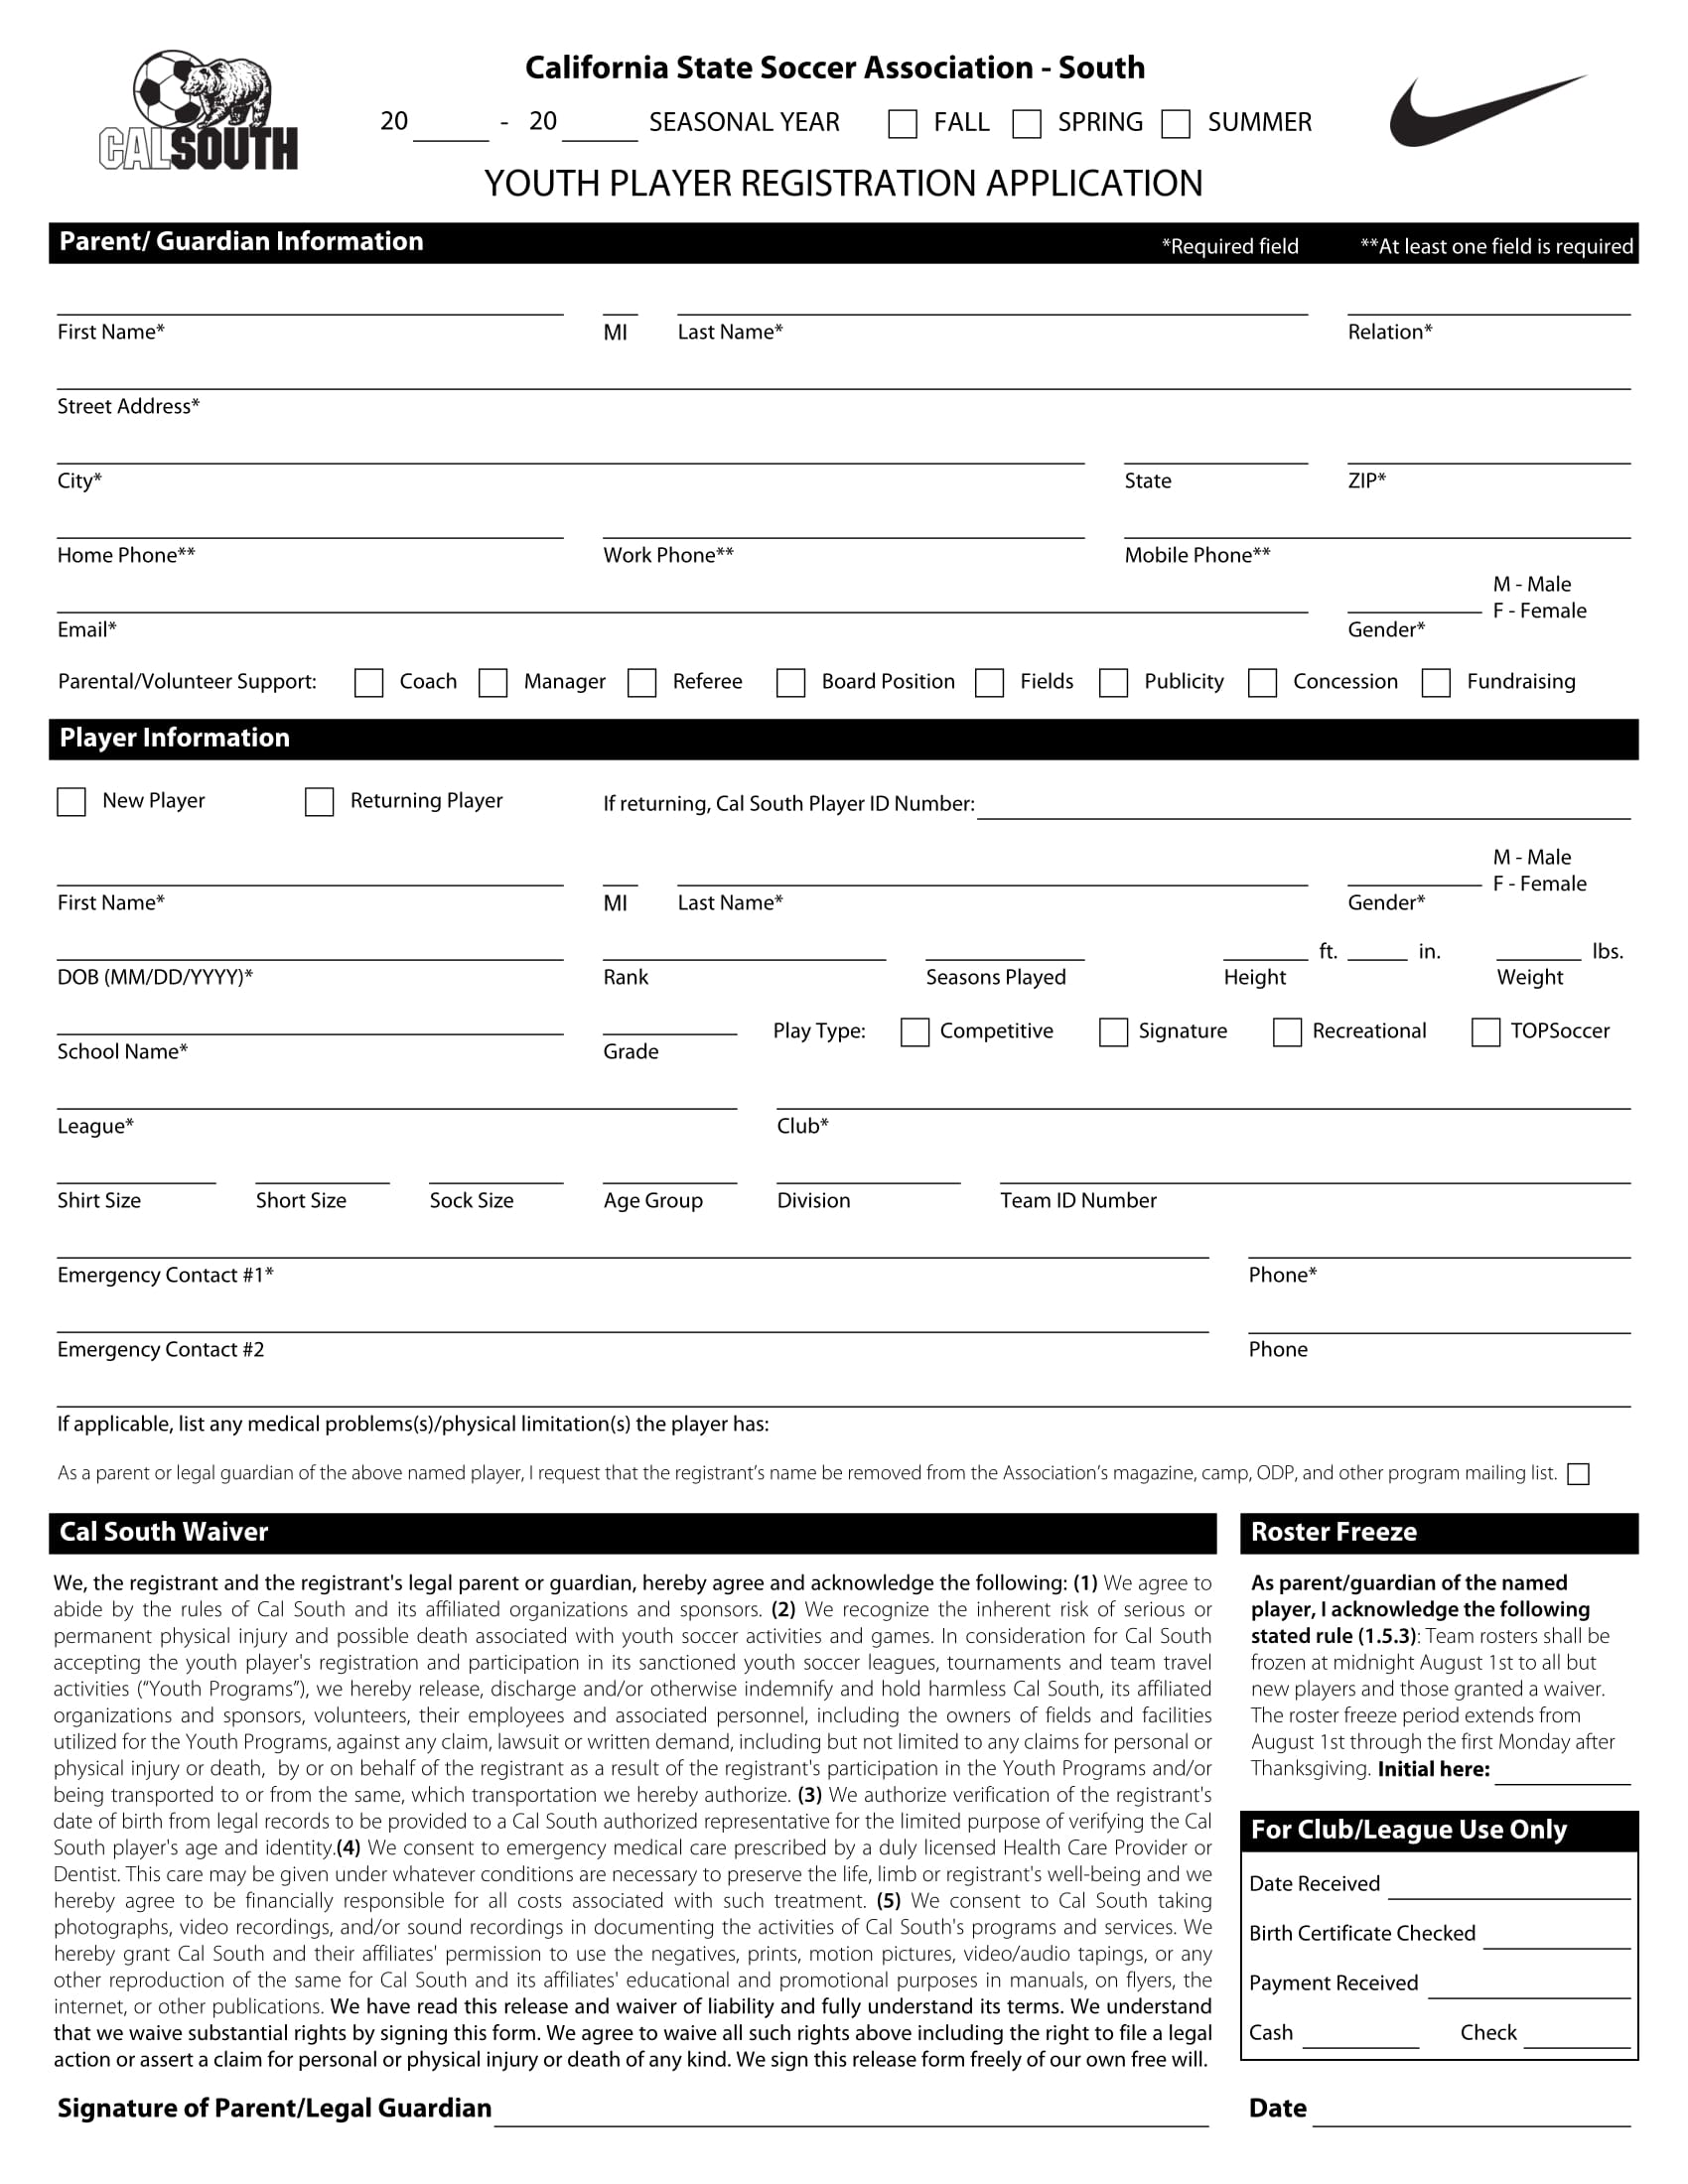 blank player registration form 1